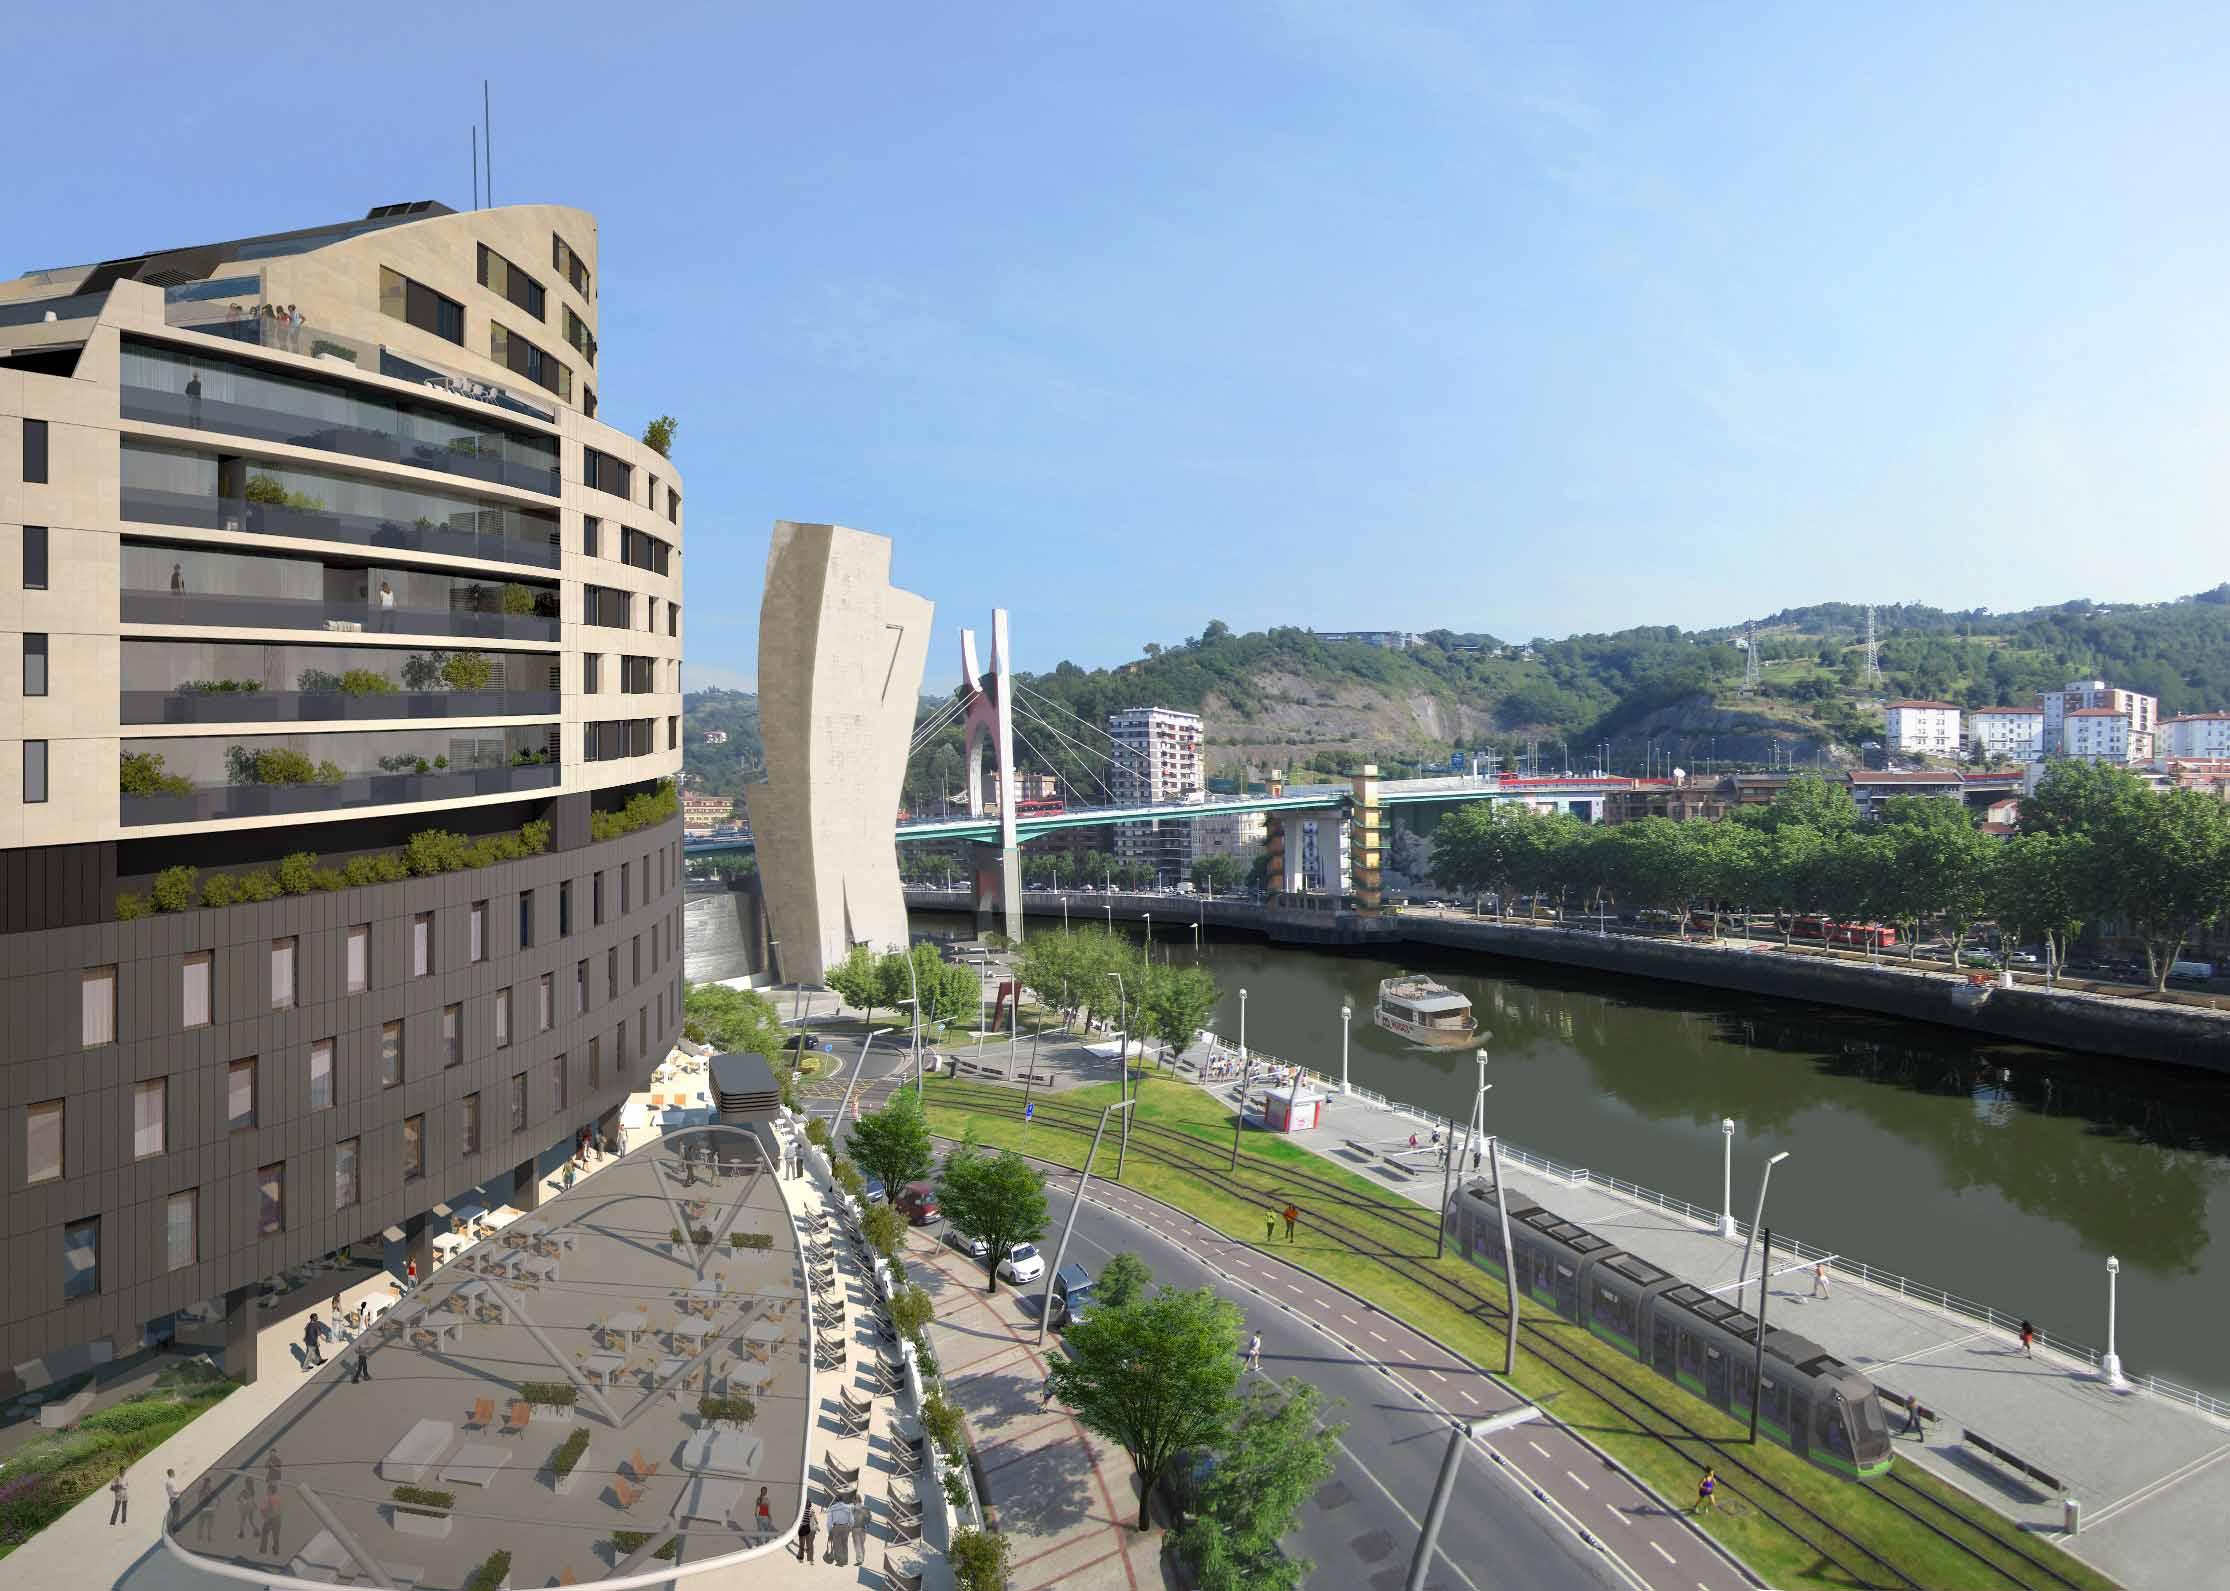 Vincci hoteles abrir un hotel con forma de velero frente for Hotel jardines de bilbao